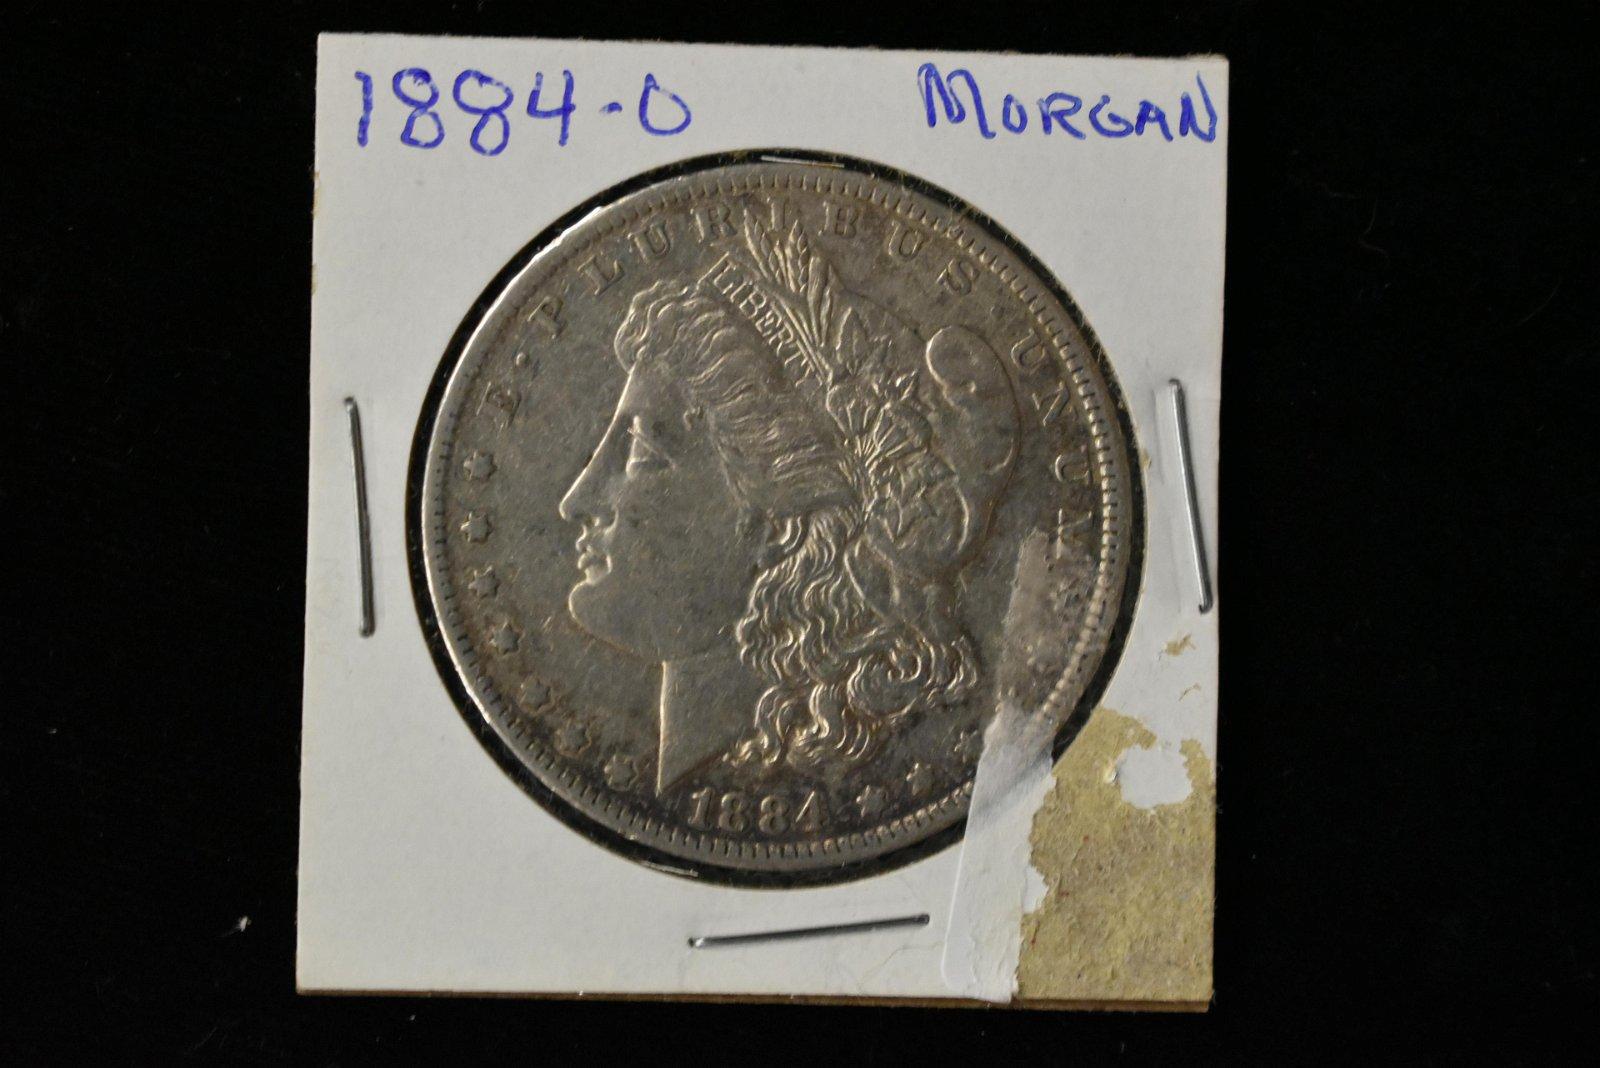 1884-O Morgan Silver Dollar, Key Date Coin